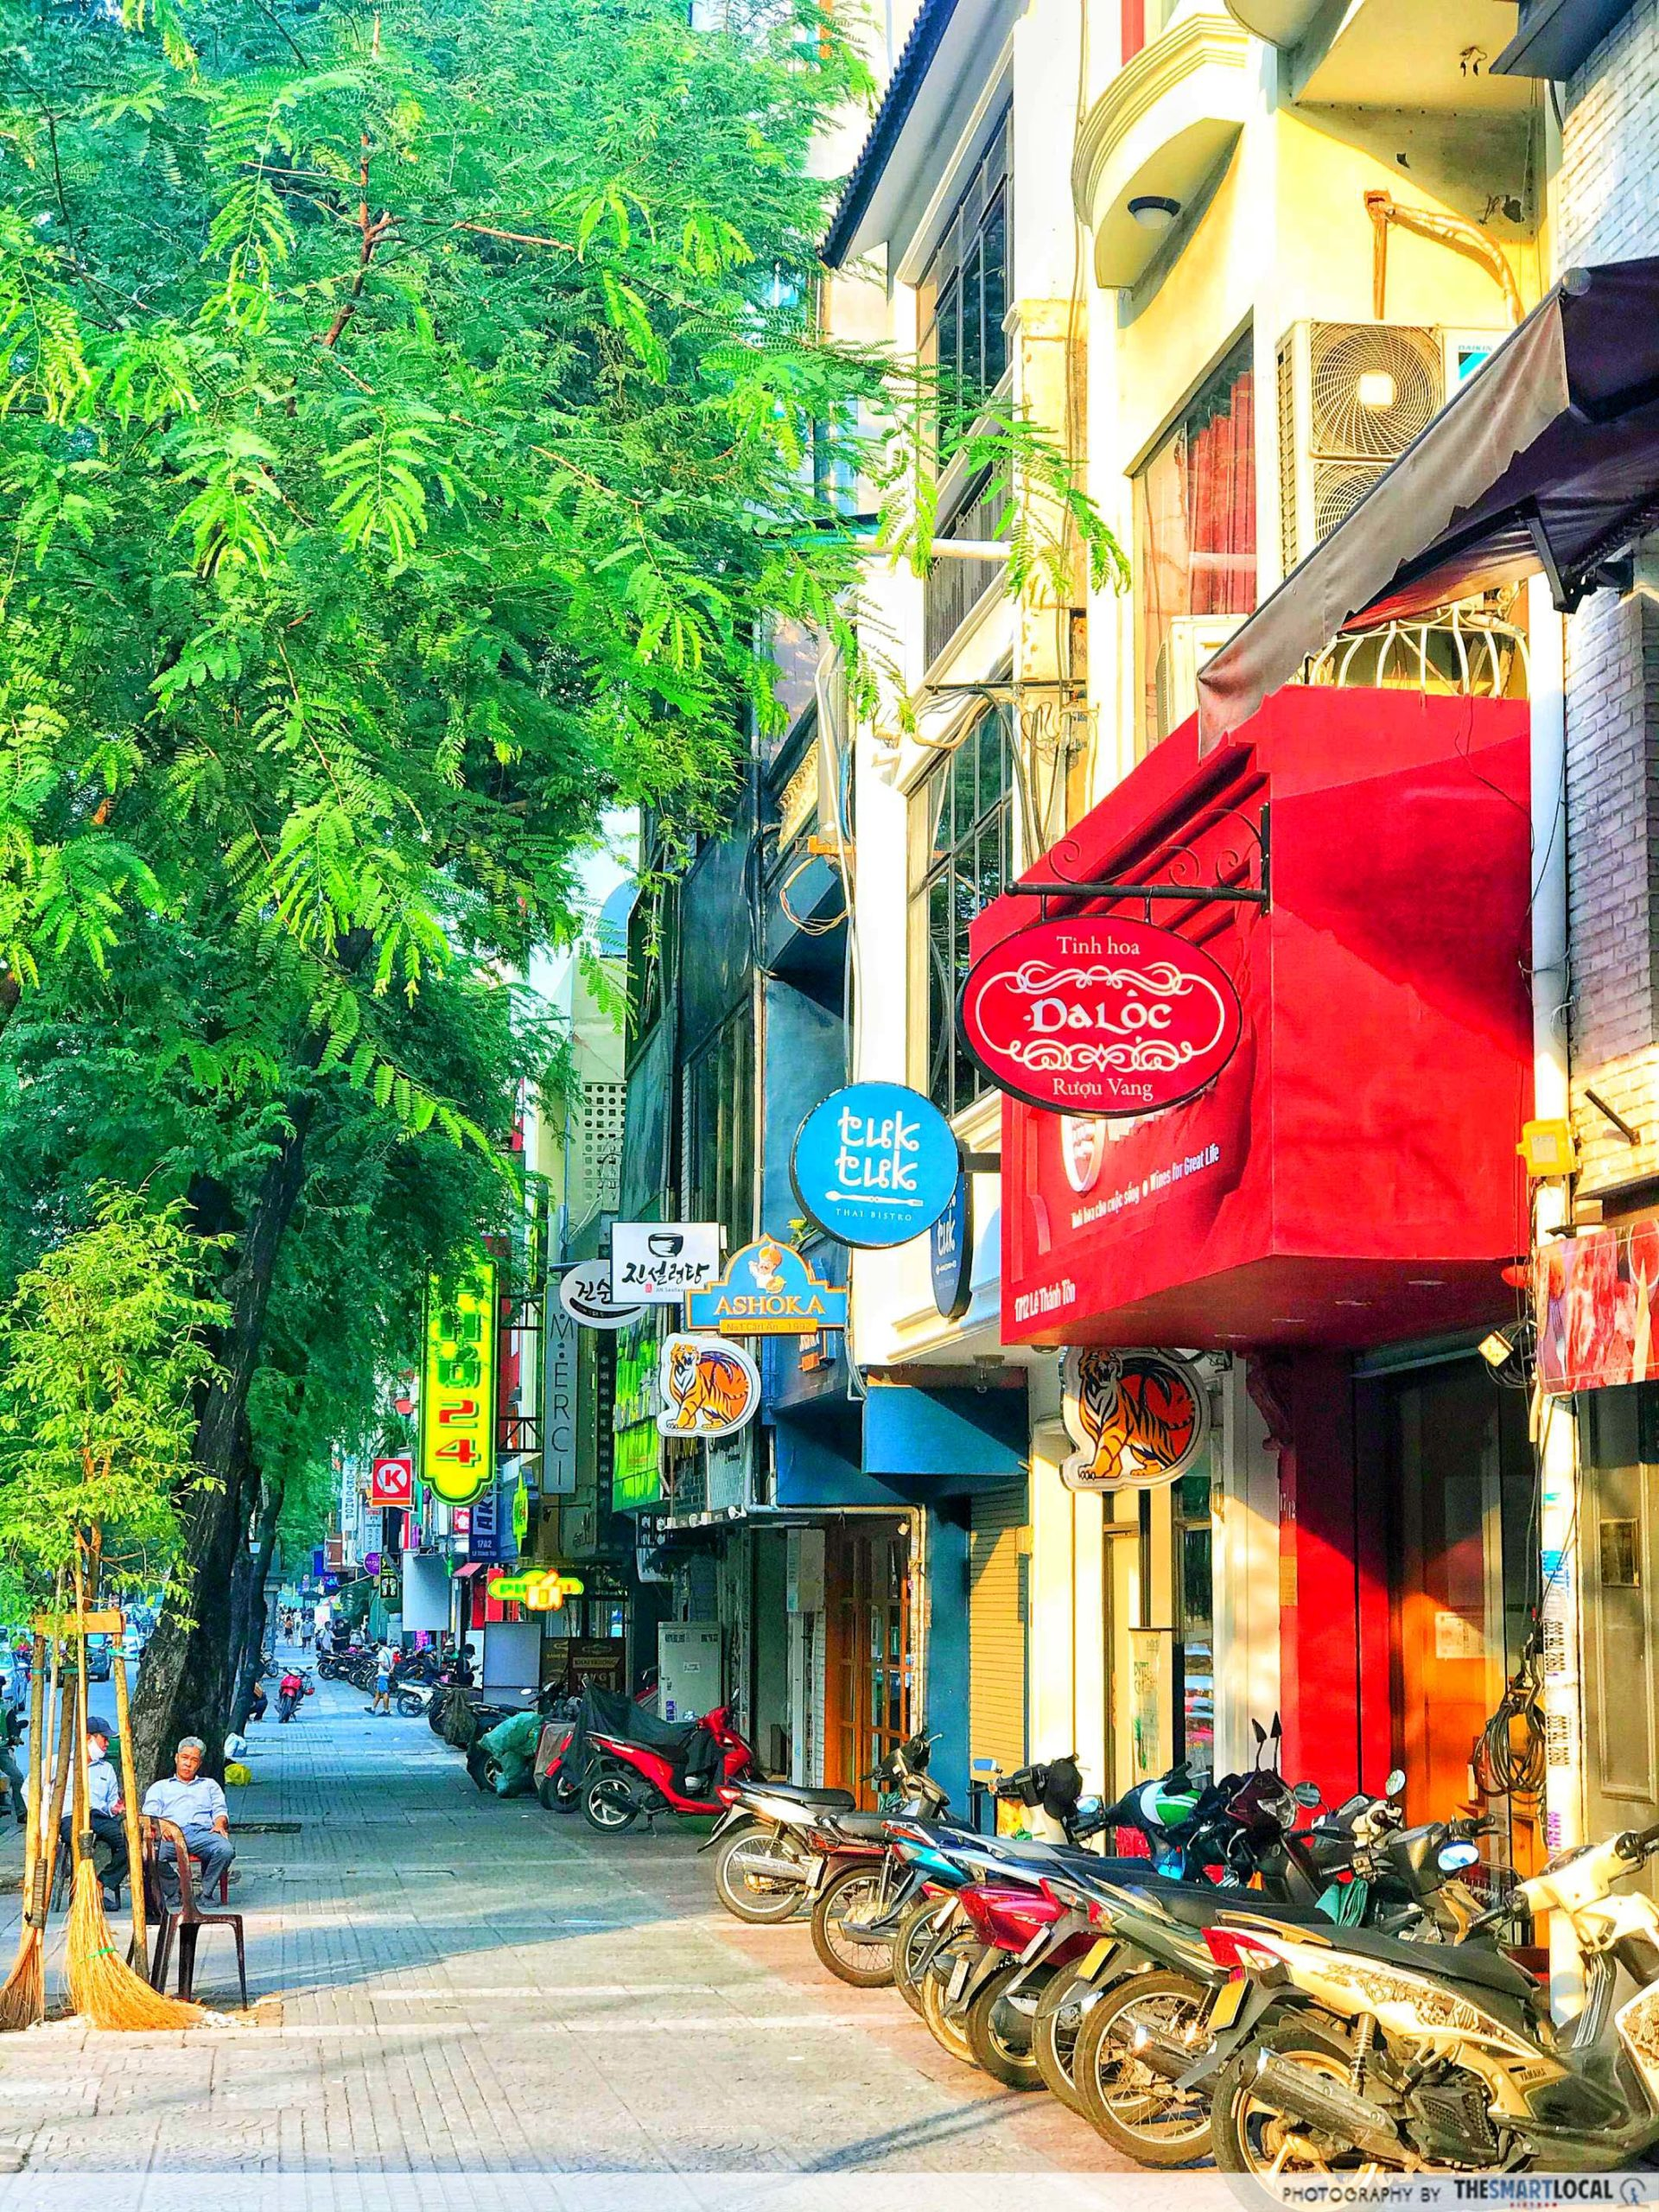 Japan town Le Thanh Ton street